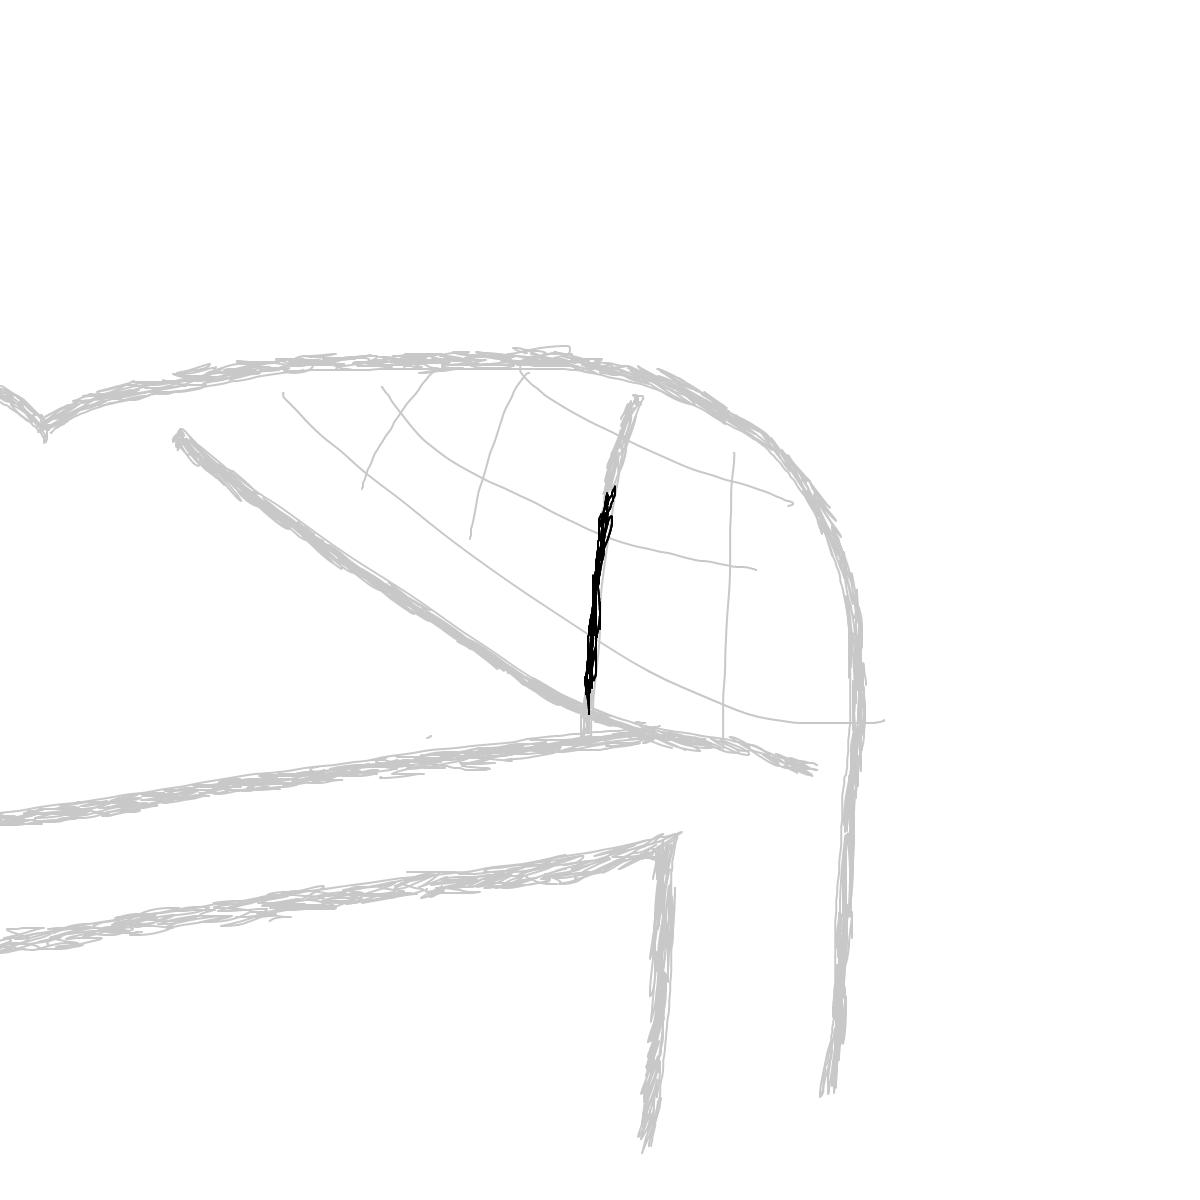 BAAAM drawing#23378 lat:46.5209426879882800lng: 6.6340680122375490